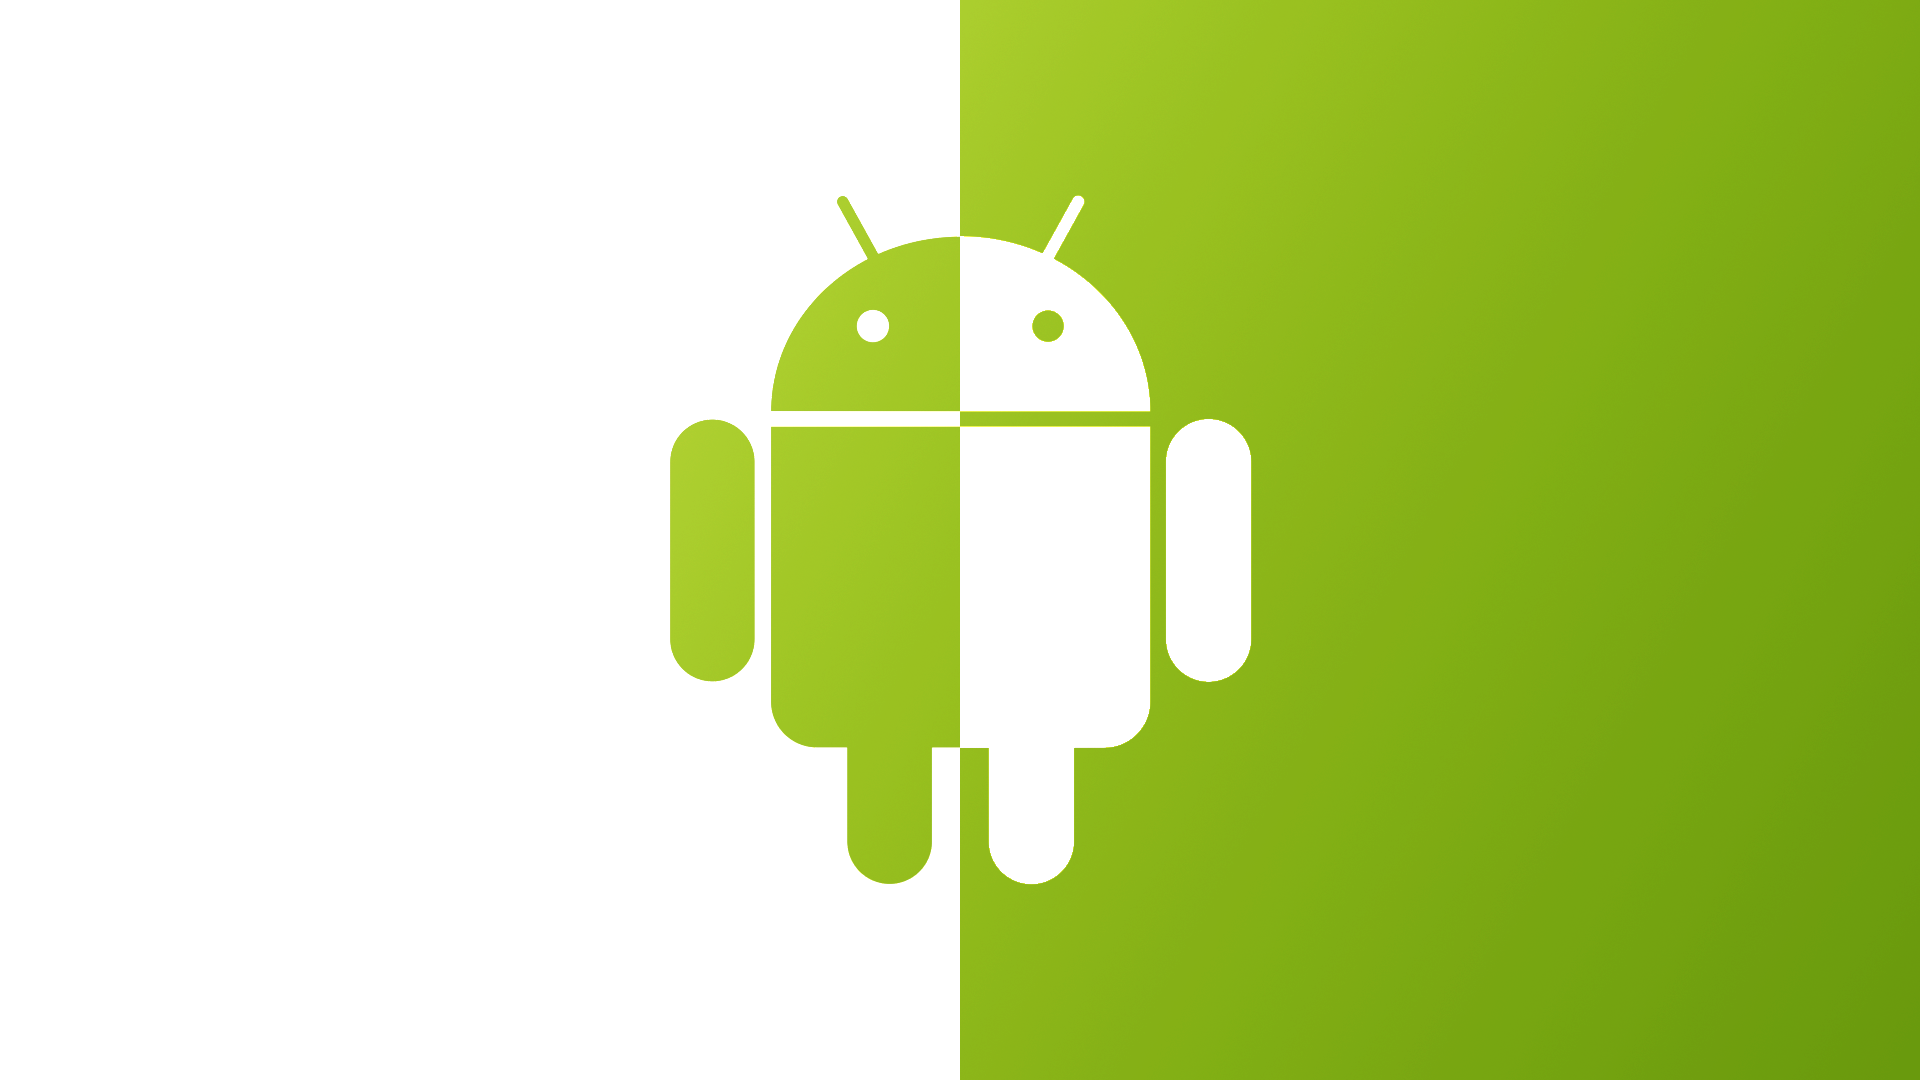 Бесплатное Приложение Обои На Андроид